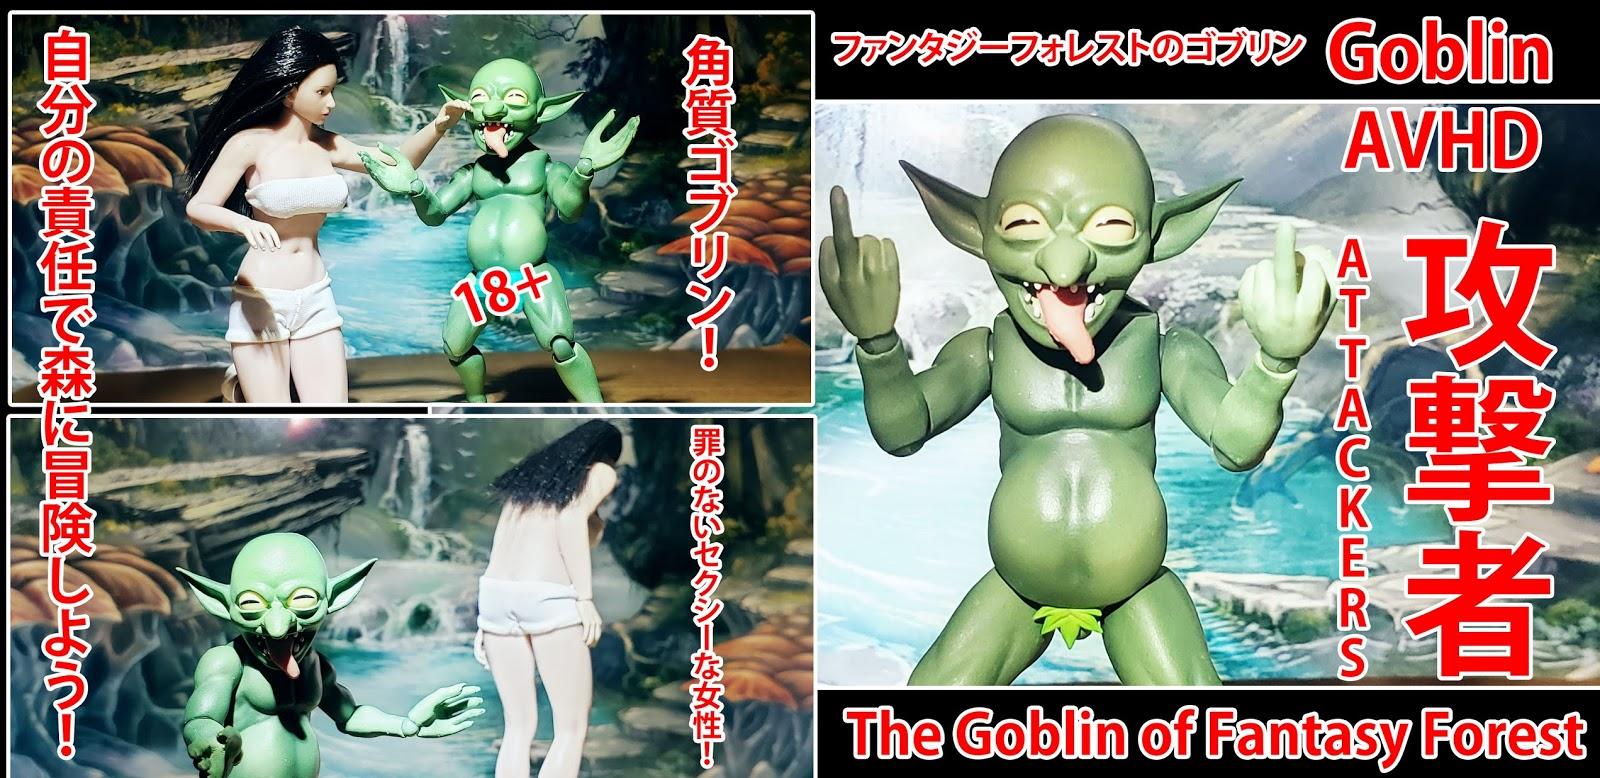 Topics tagged under goblin on OneSixthFigures Zz-AttackersGoblinDVD